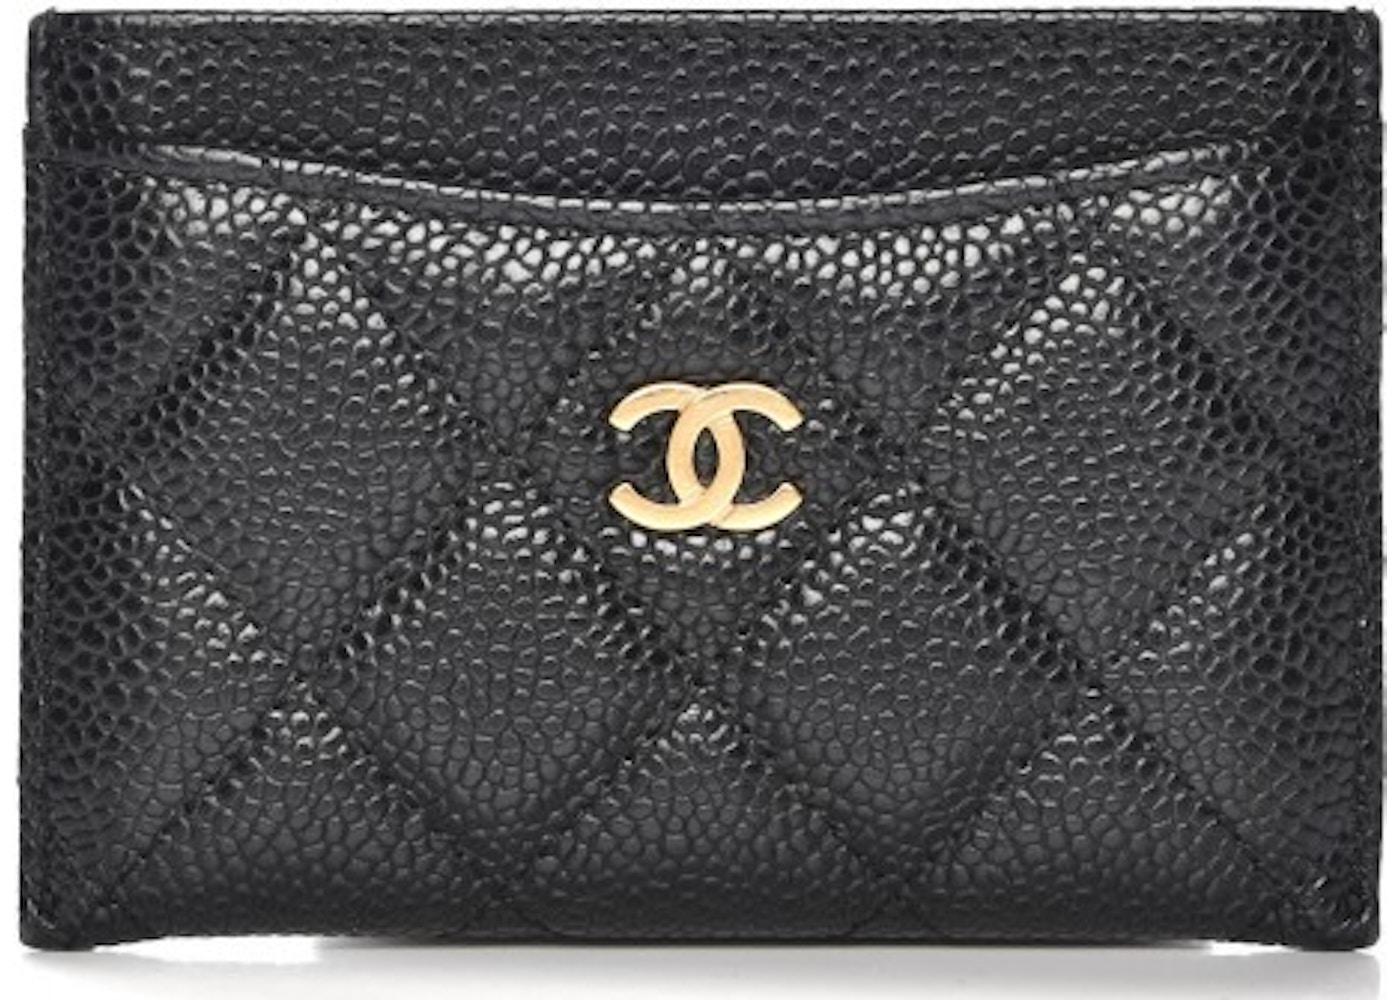 4653e9cbfeb9 Chanel CC Card Holder Quilted Diamond Black. Quilted Diamond Black